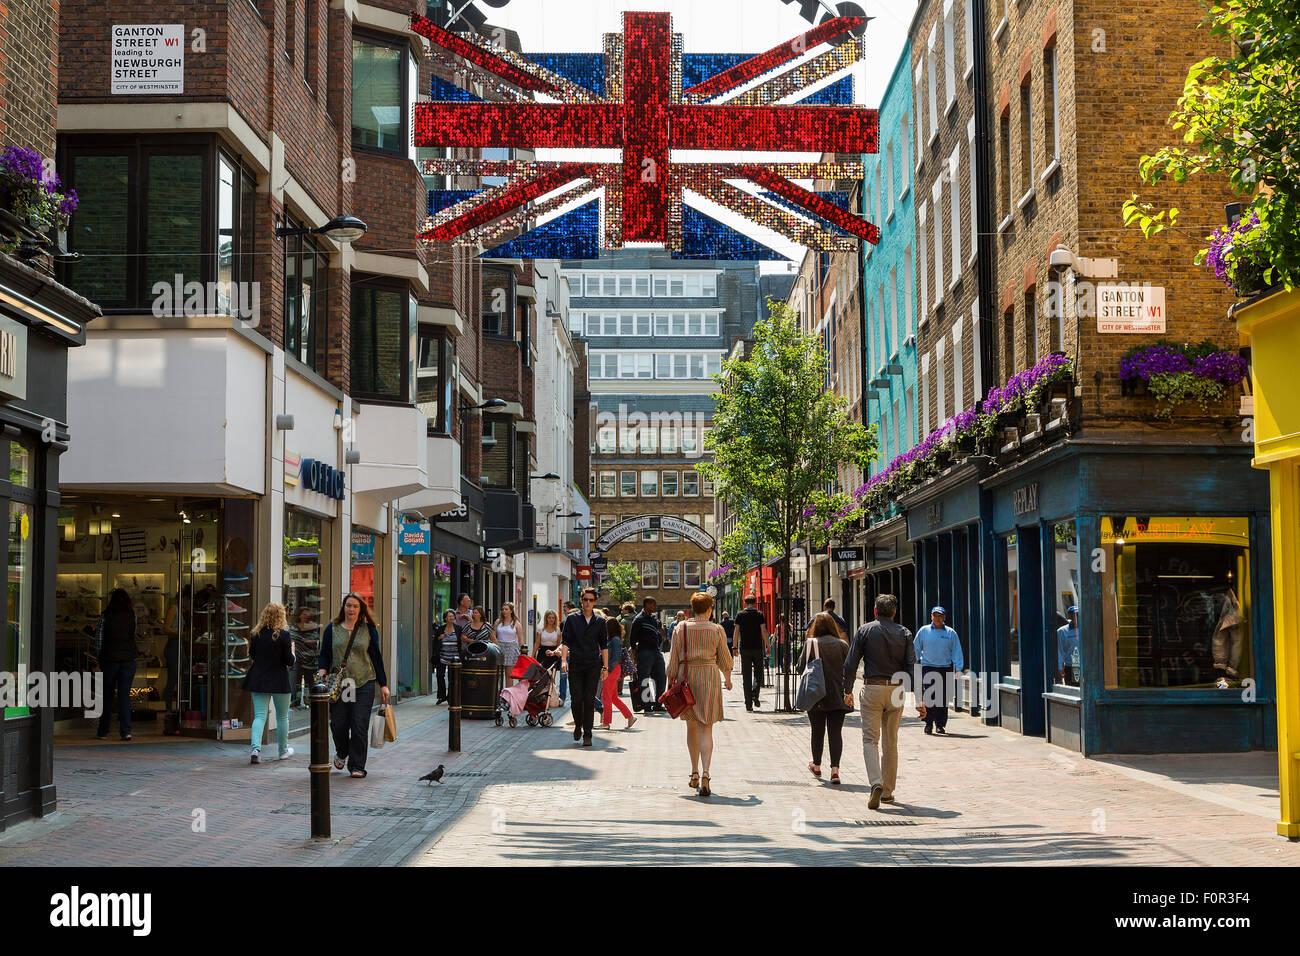 London, Carnaby Street - Stock Image